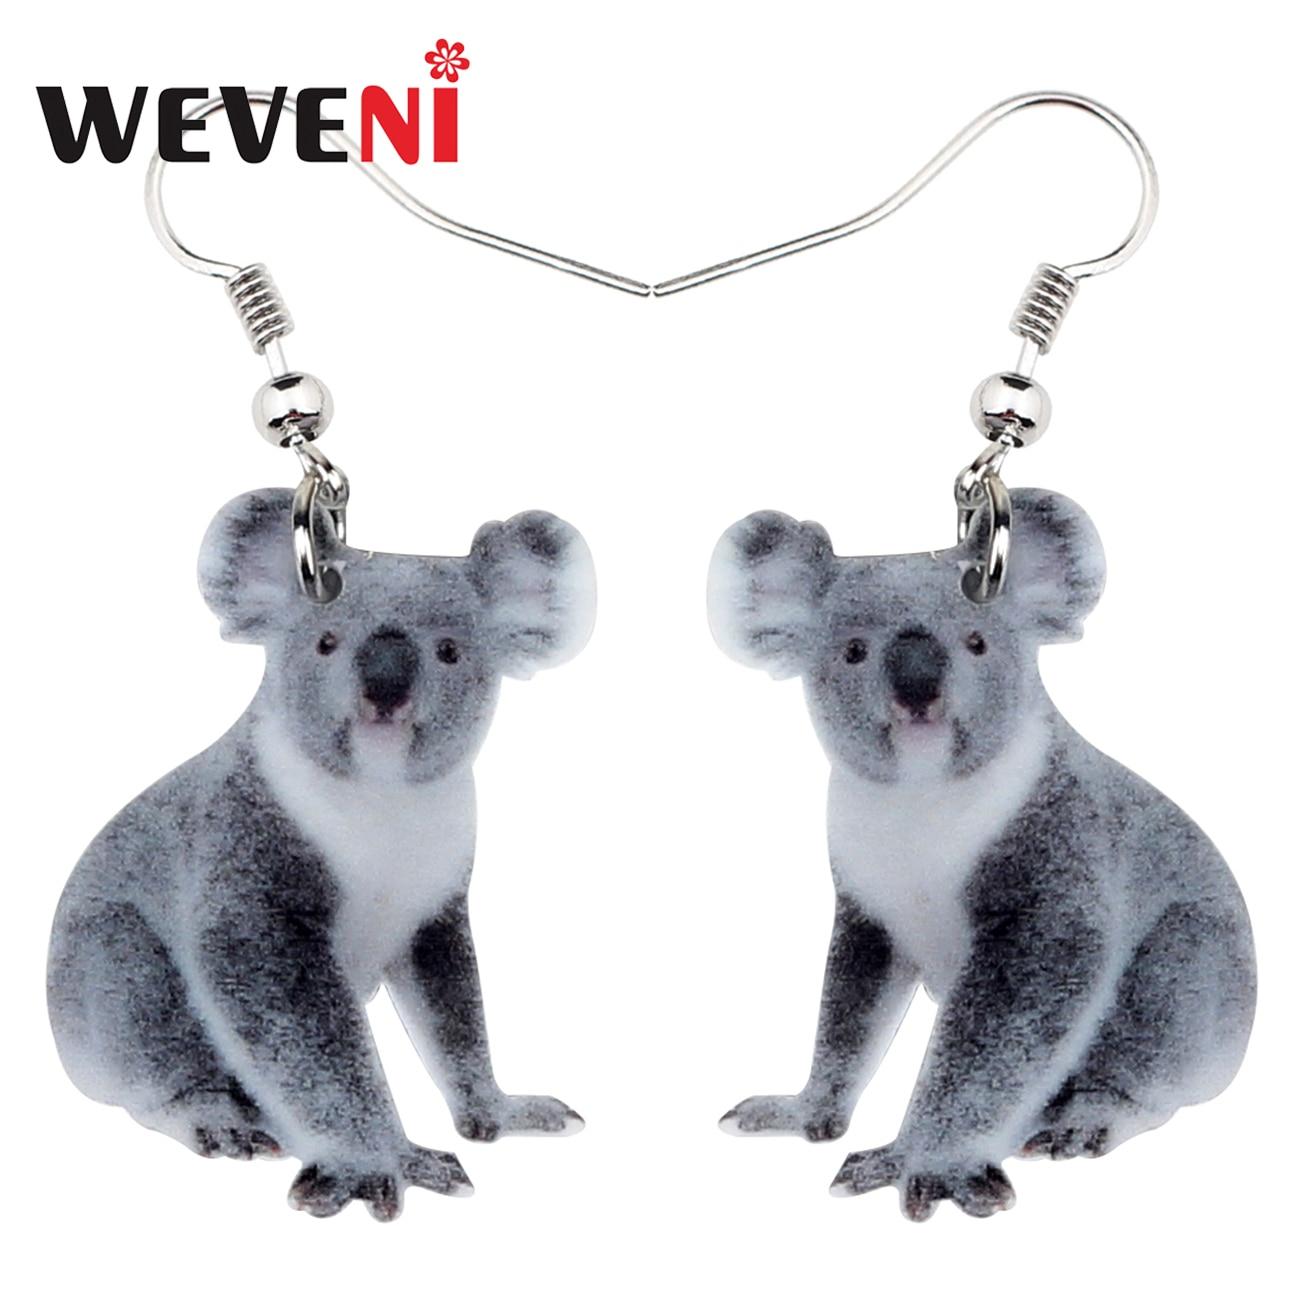 WEVENI acrílico australiano Koala oso pendientes gota colgante Animal novedad joyería para mujeres niñas regalo encantos accesorios Bijoux